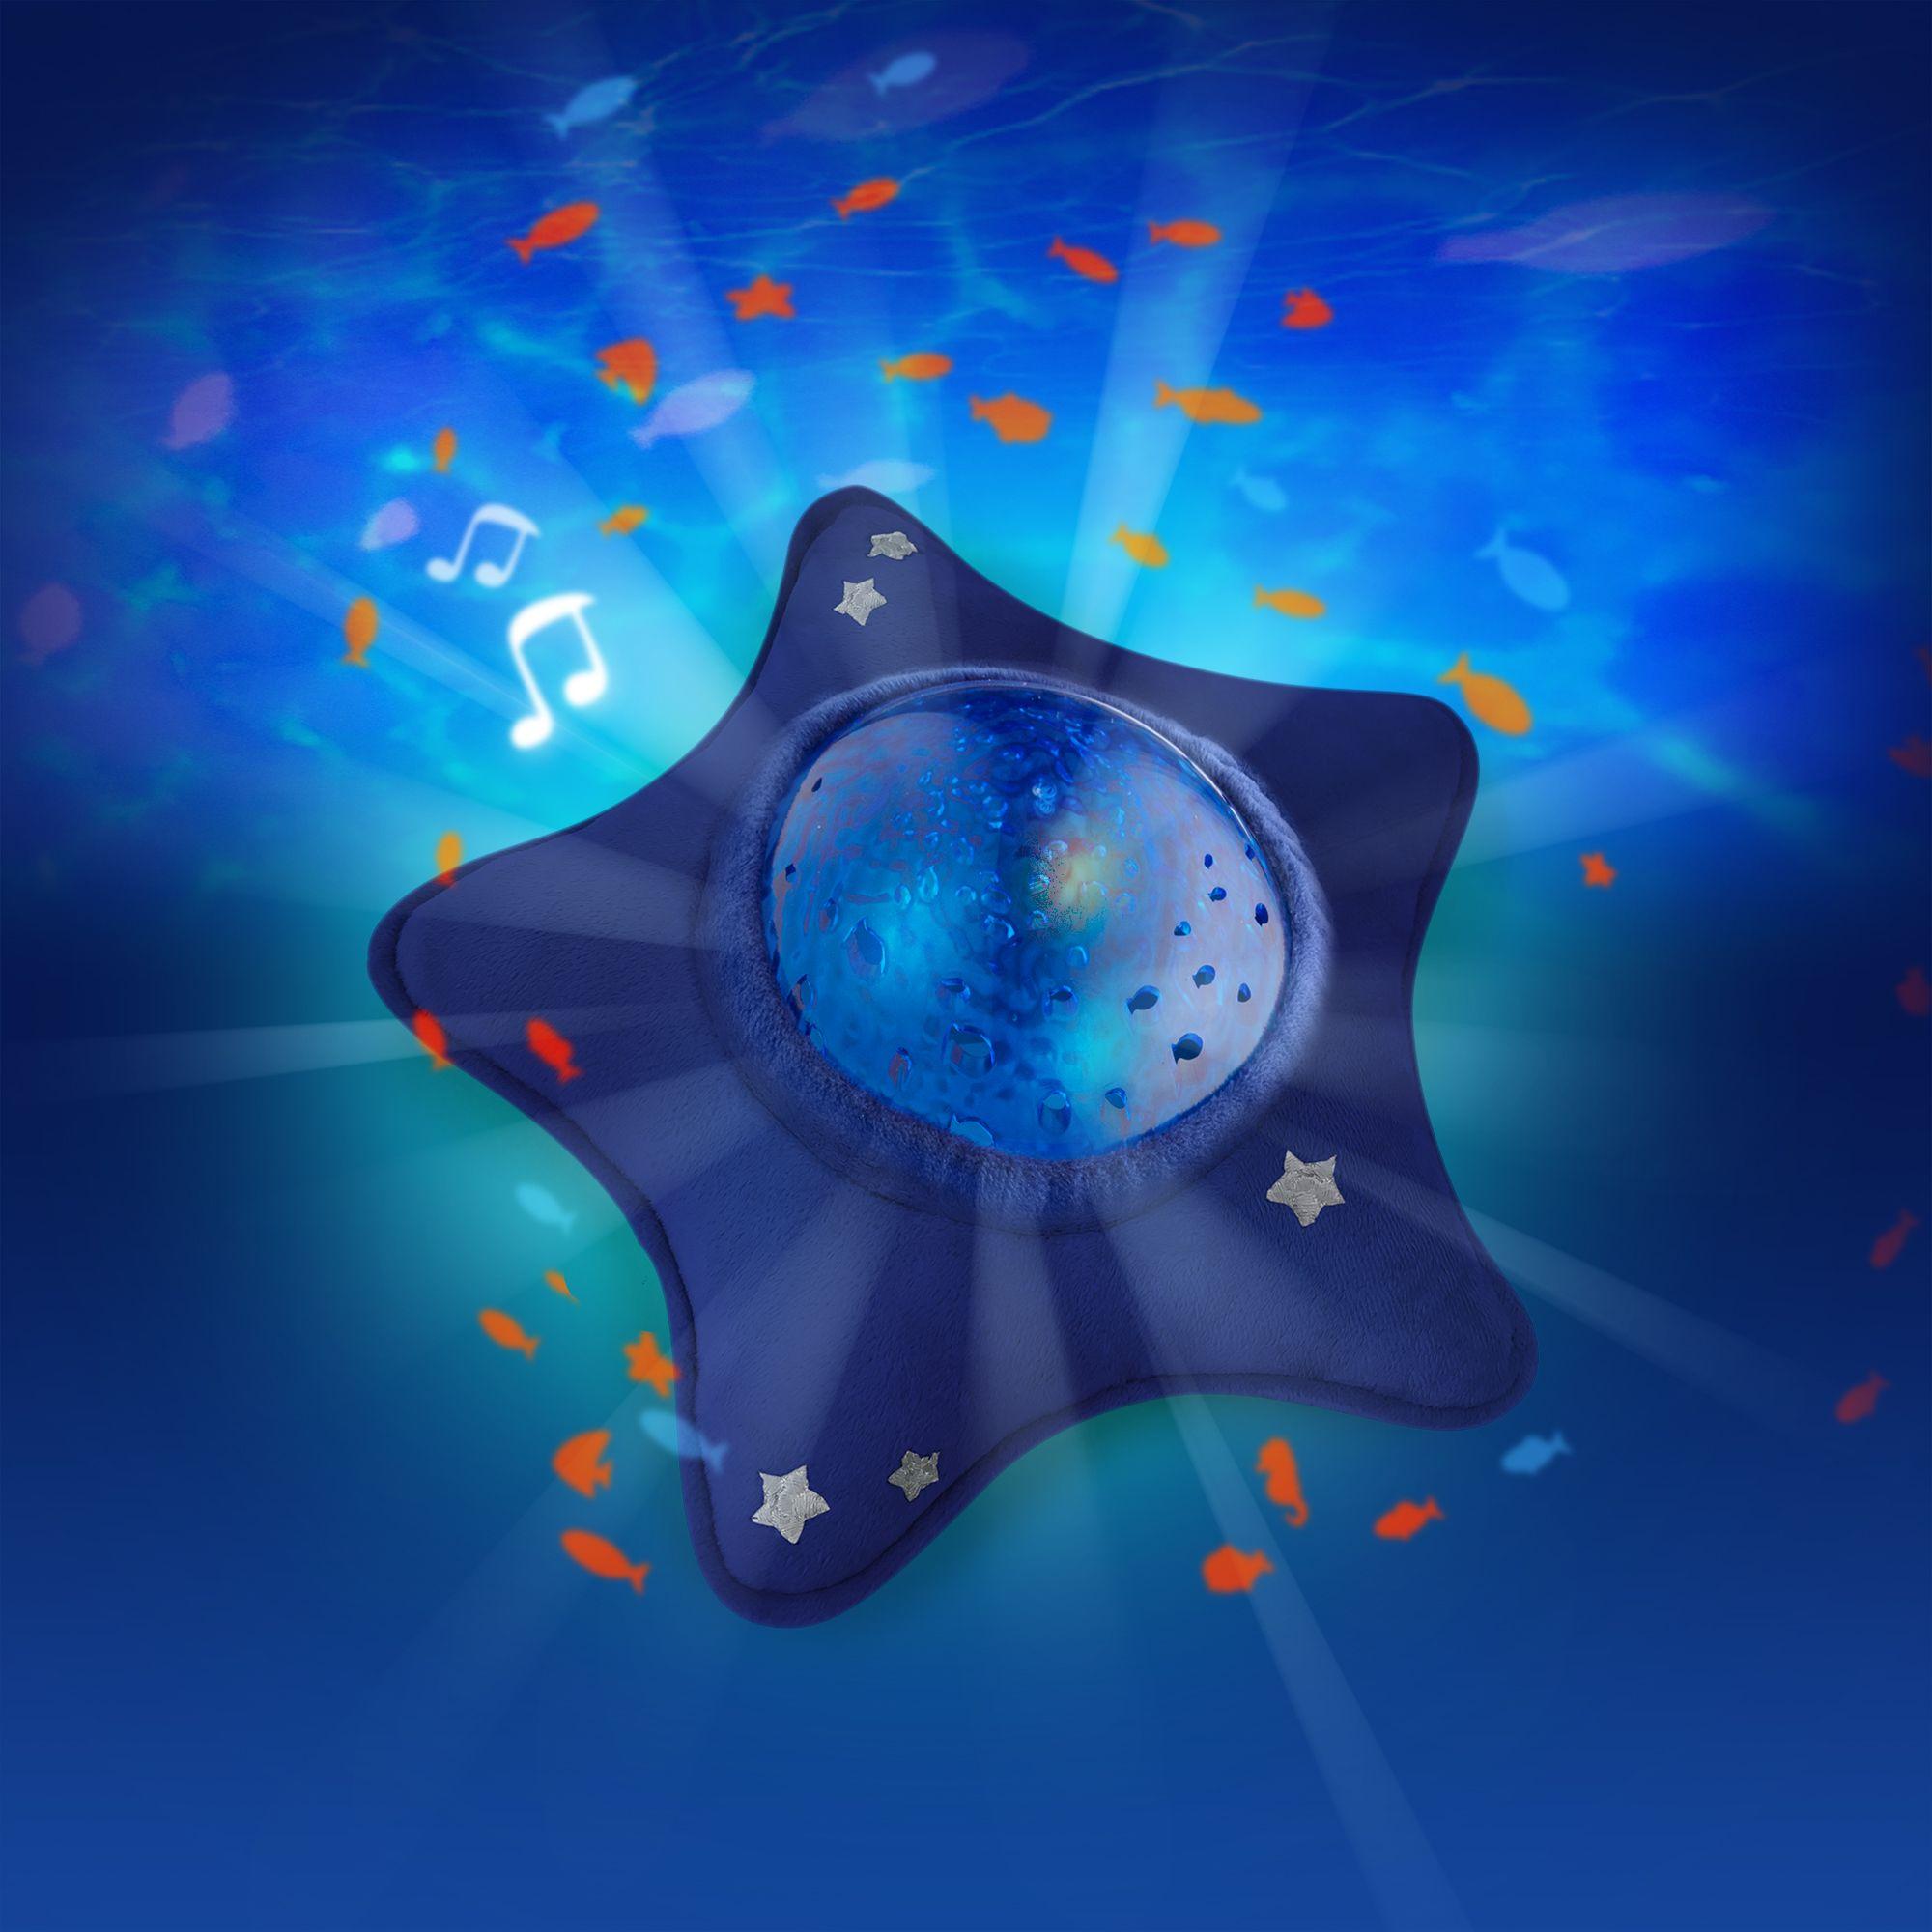 Veilleuse Projecteur d'ambiance Calm Ocean PABOBO